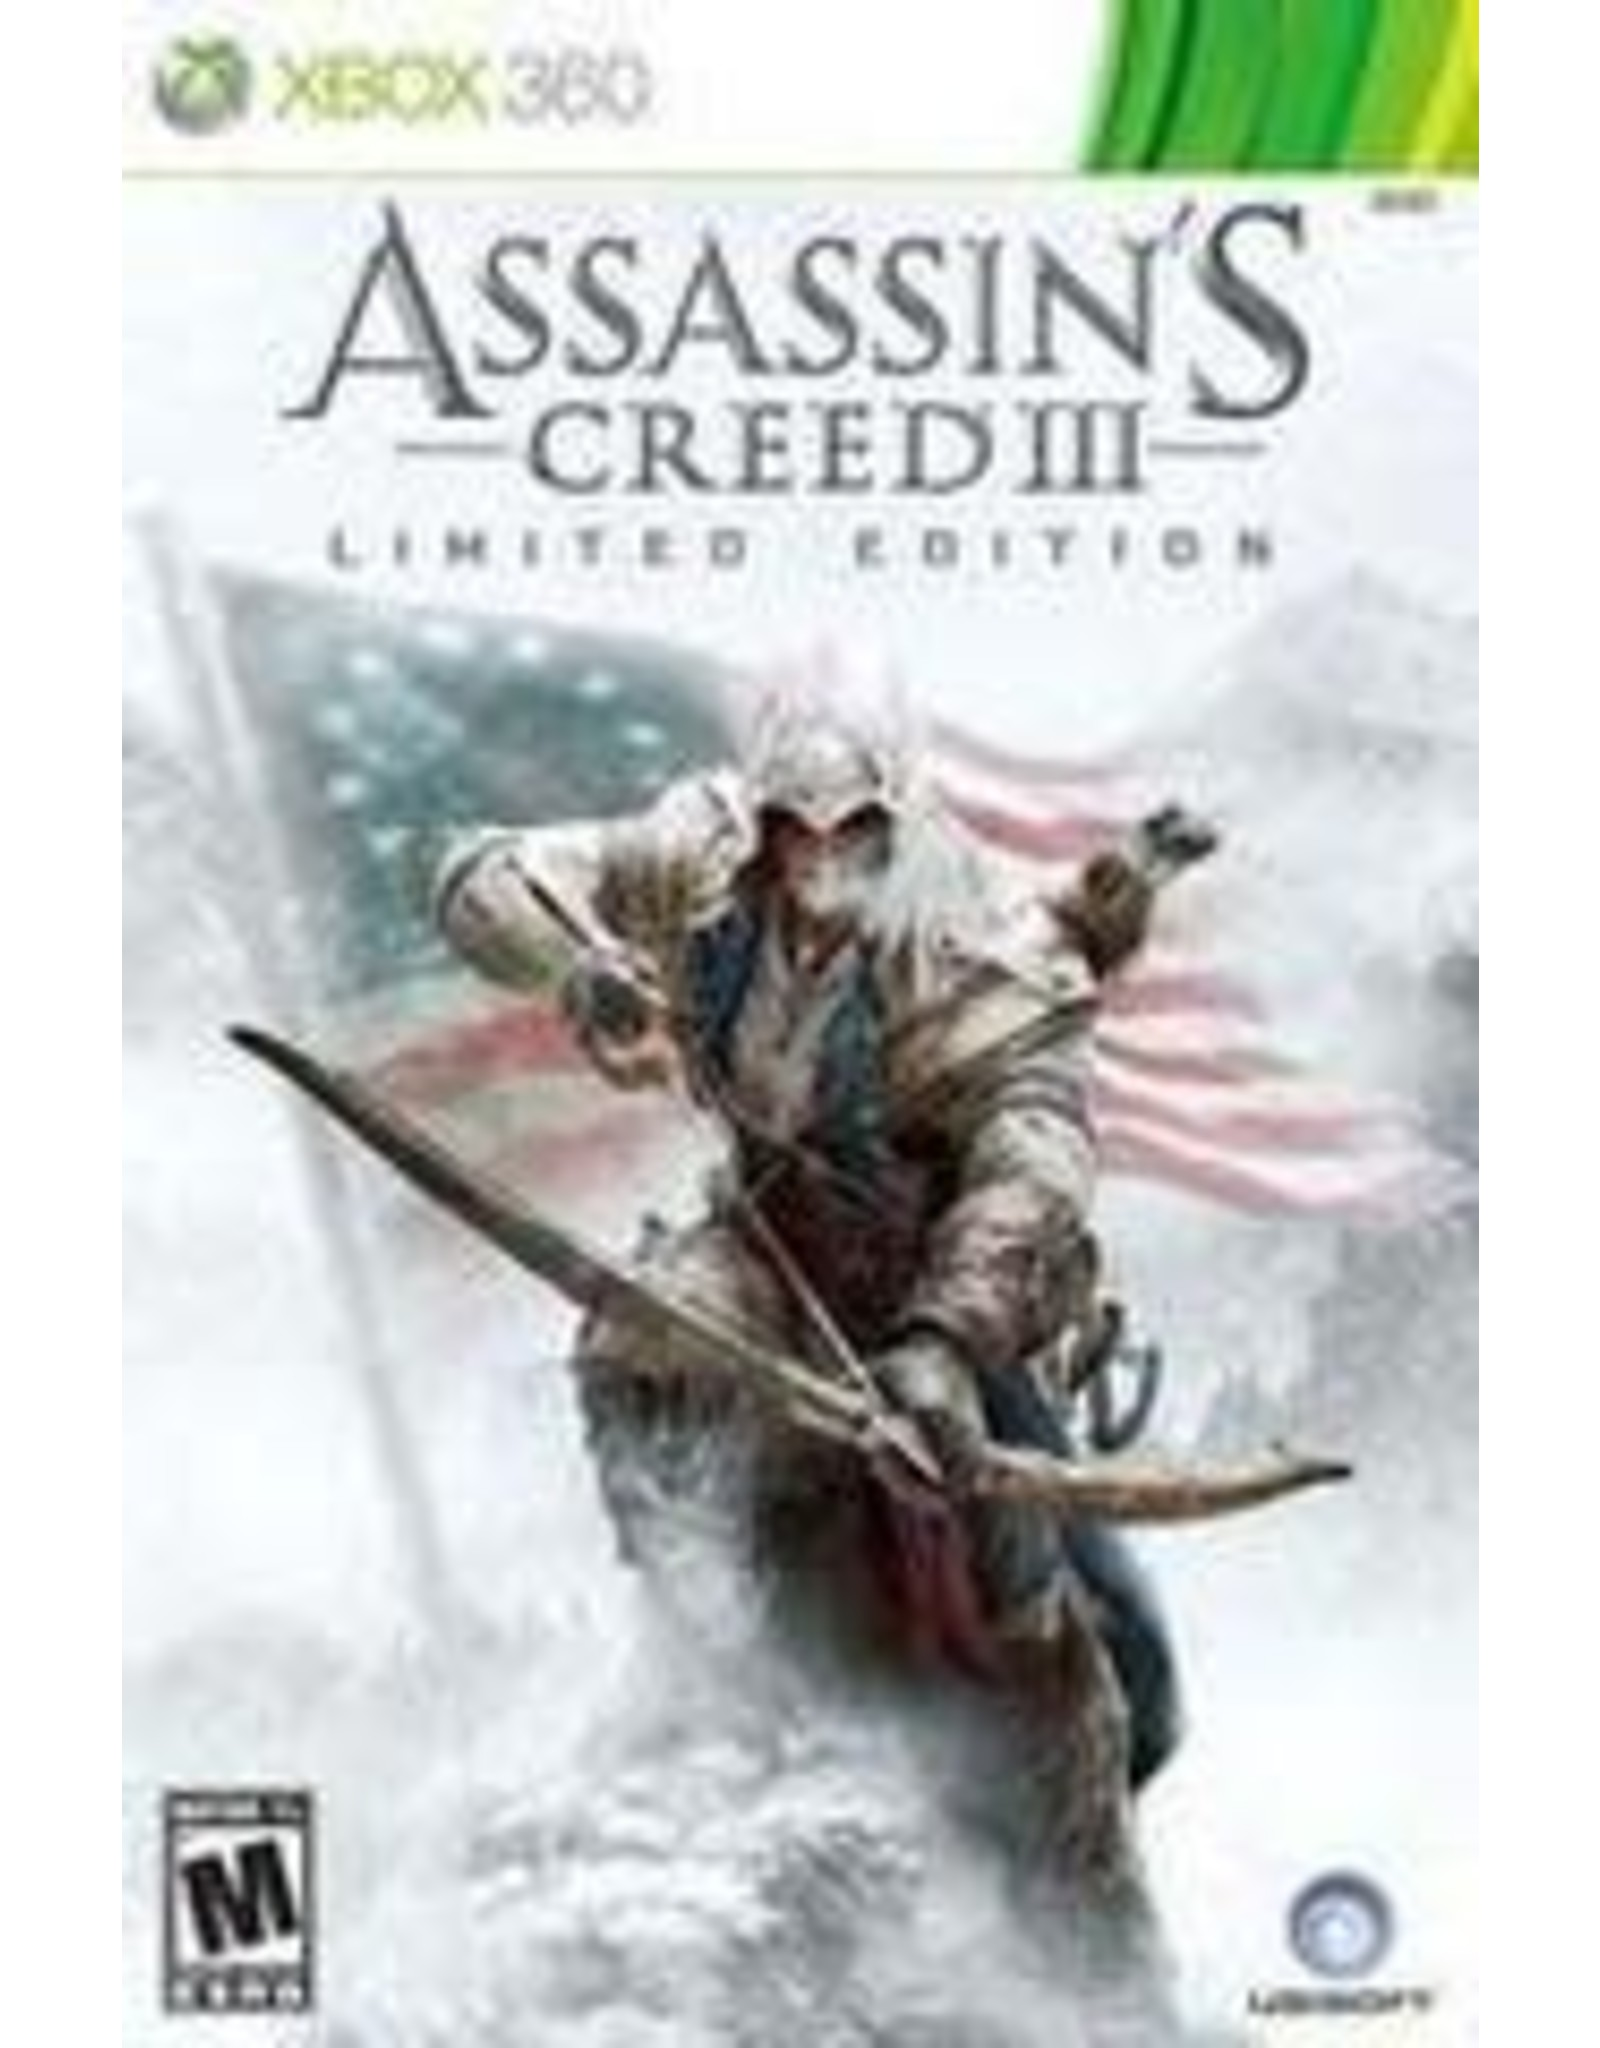 Xbox 360 Assassin's Creed III Limited Edition (CiB)